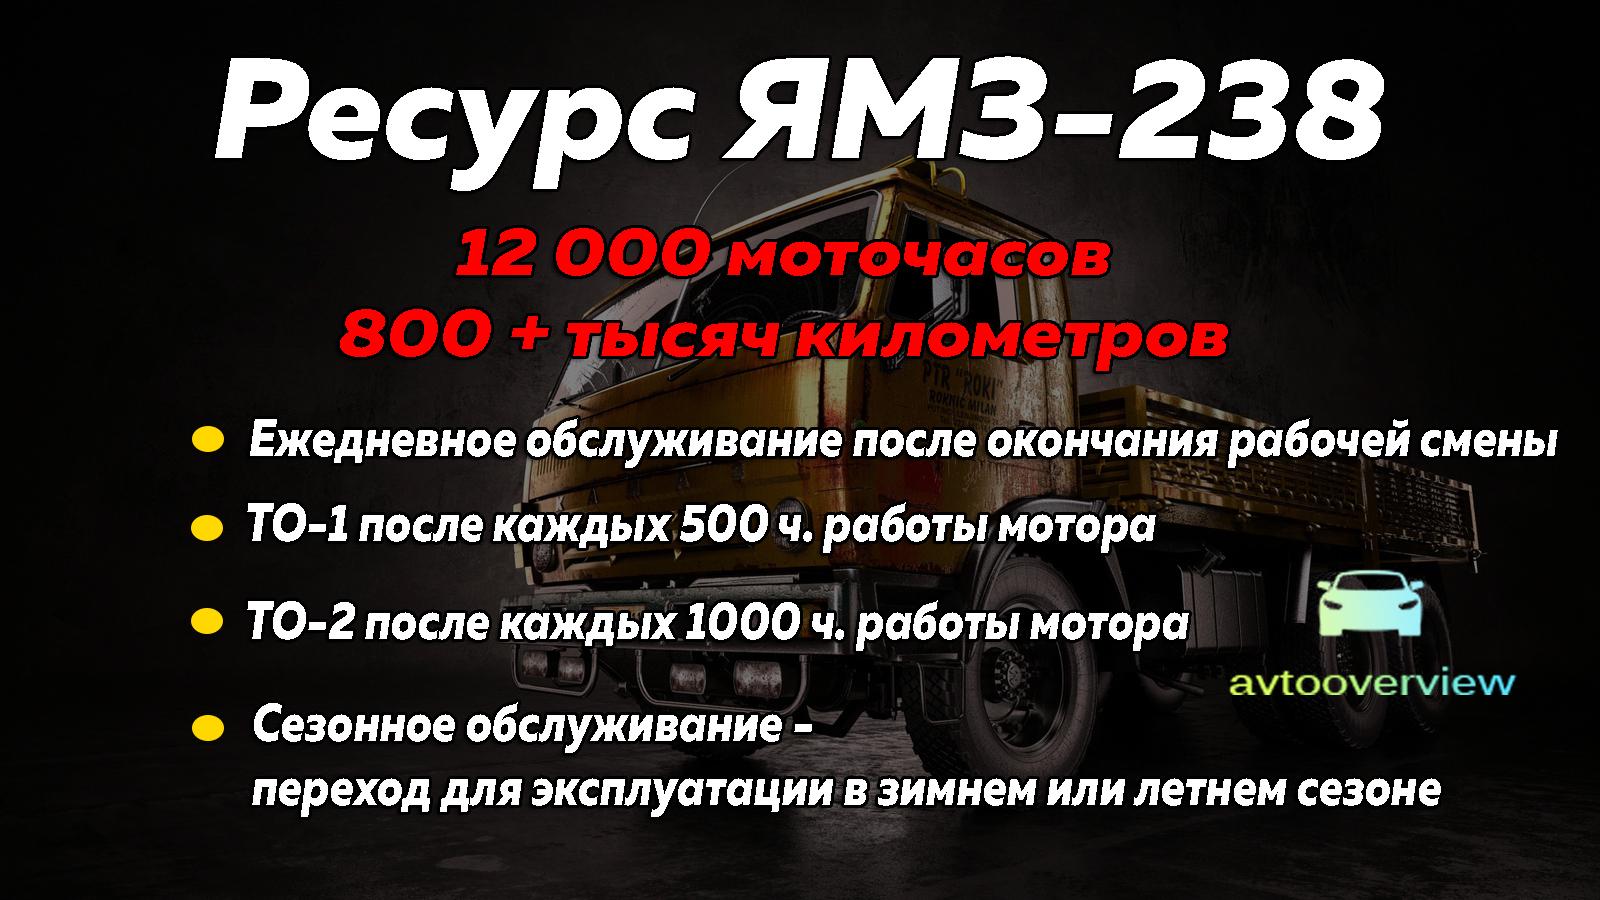 Ресурс двигателя ЯМЗ 238